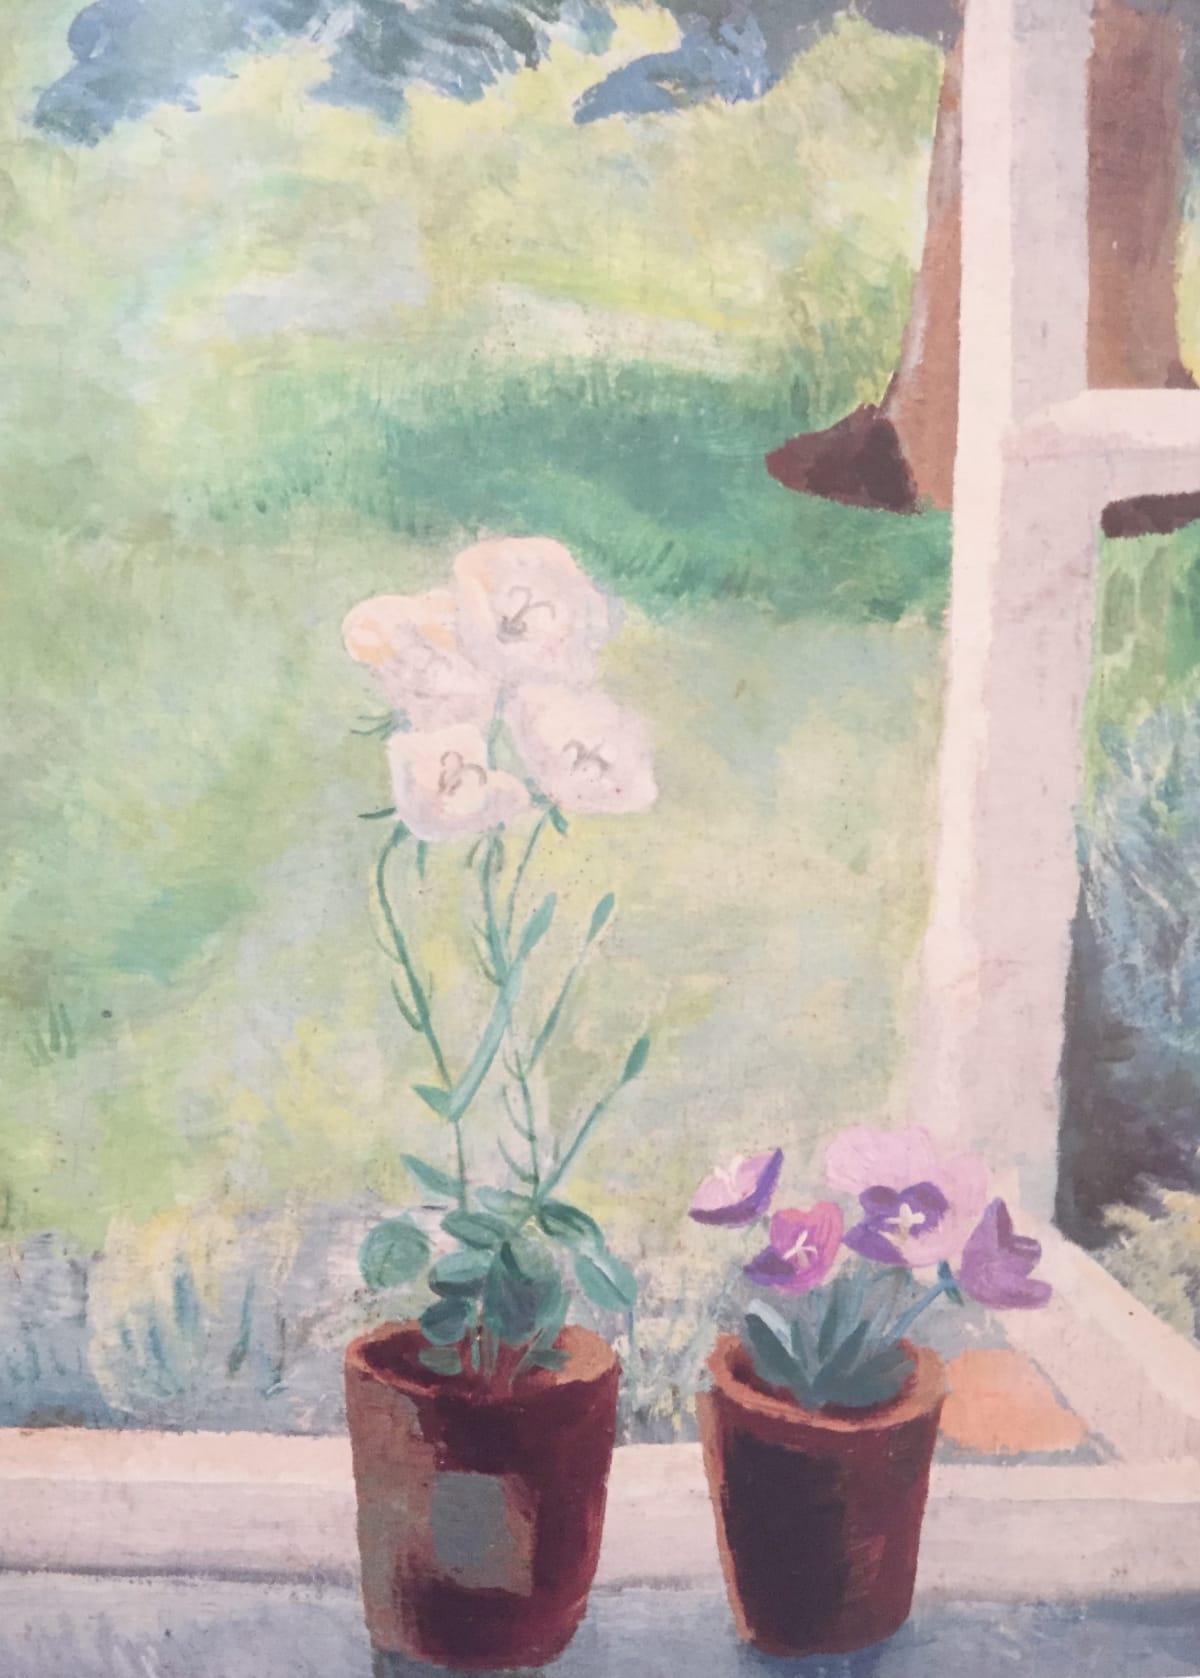 Winifred NICHOLSON (1893 – 1981) Campanulas, c.1935 Oil on board 20 x 15 ¾ inches / 50.8 x 40 cm